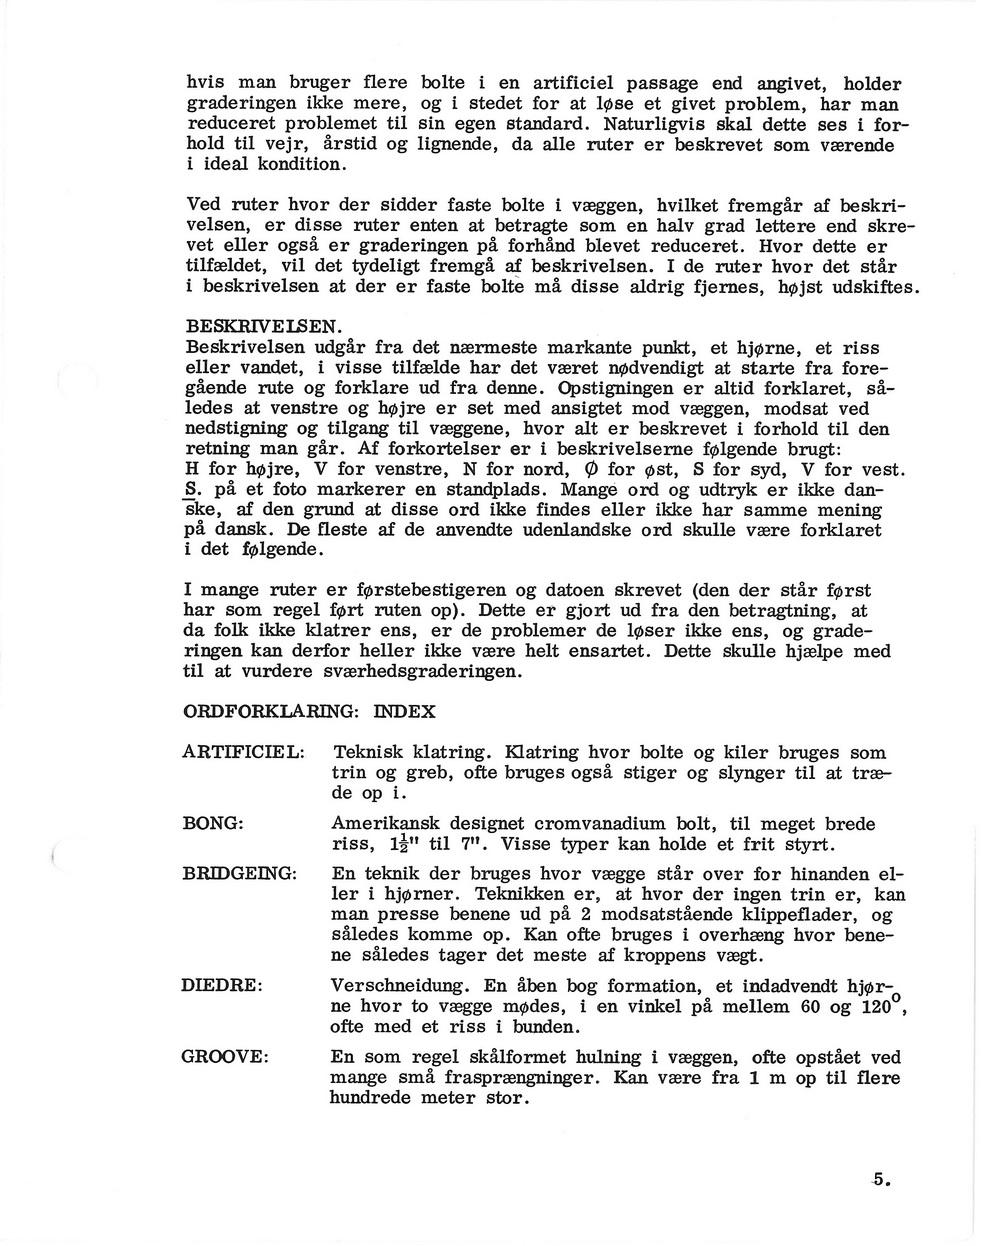 Kullen guide 1972 005.jpg